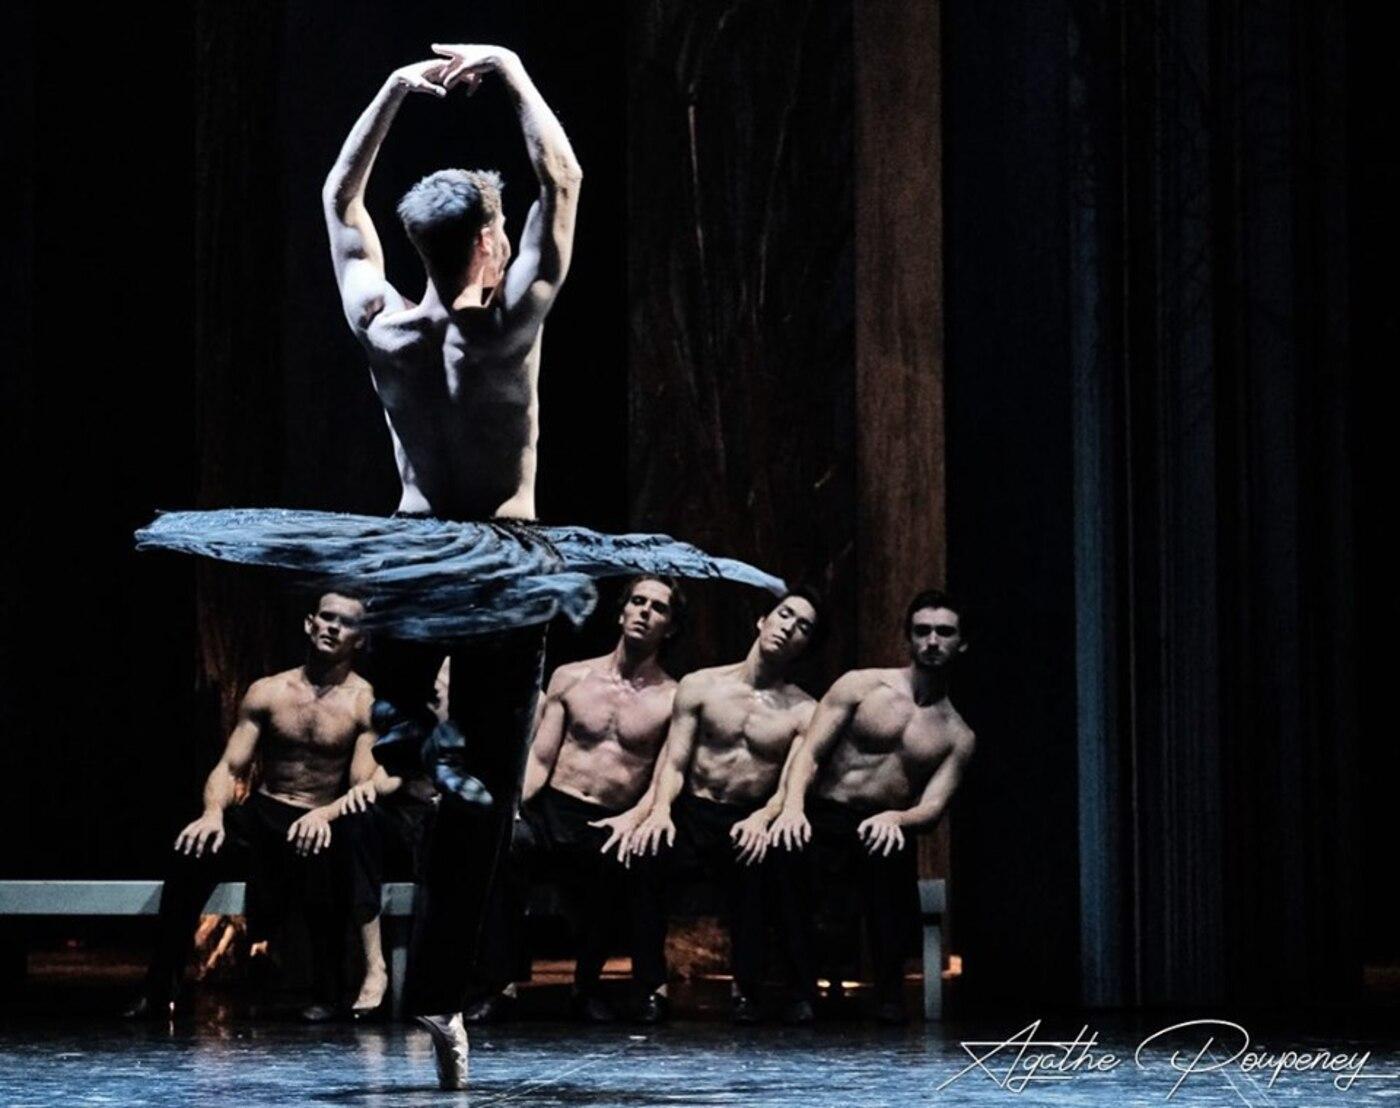 Ballet in Progress : Danser Chostakovitch, Tchaïkovski du Ballet de l'Opéra national du Rhin